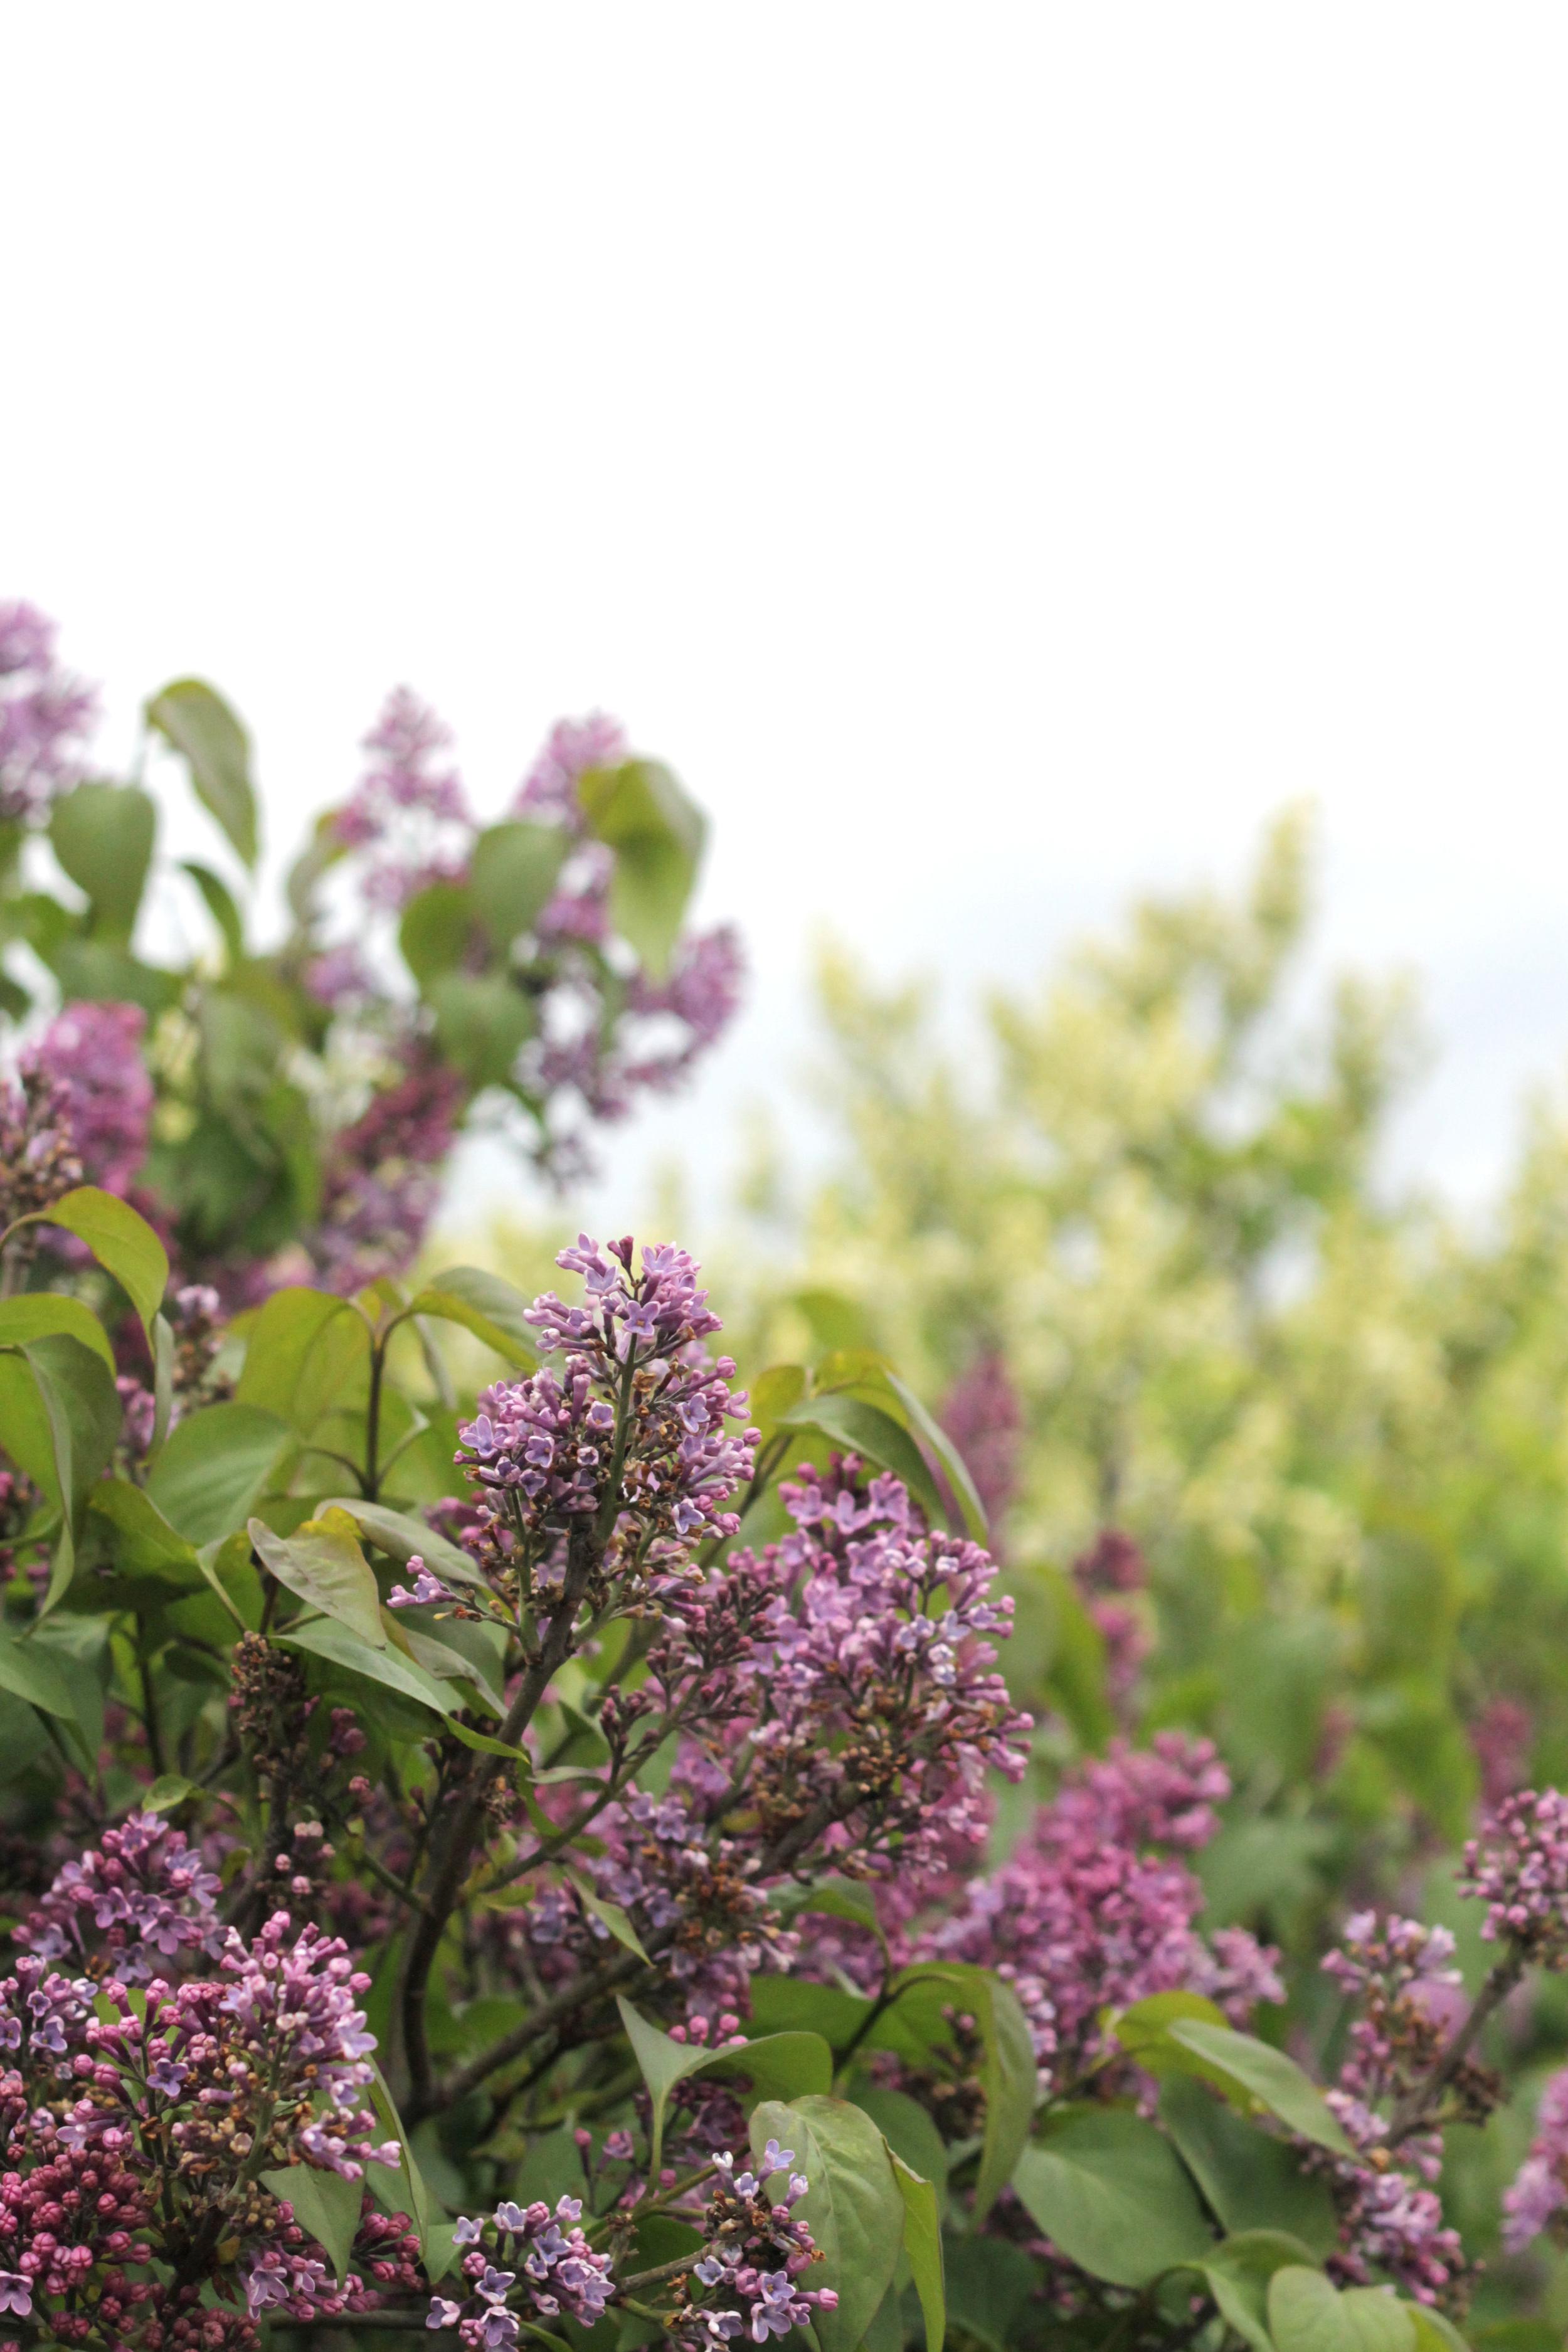 lilacs inb copenhagen | via bekuh b.